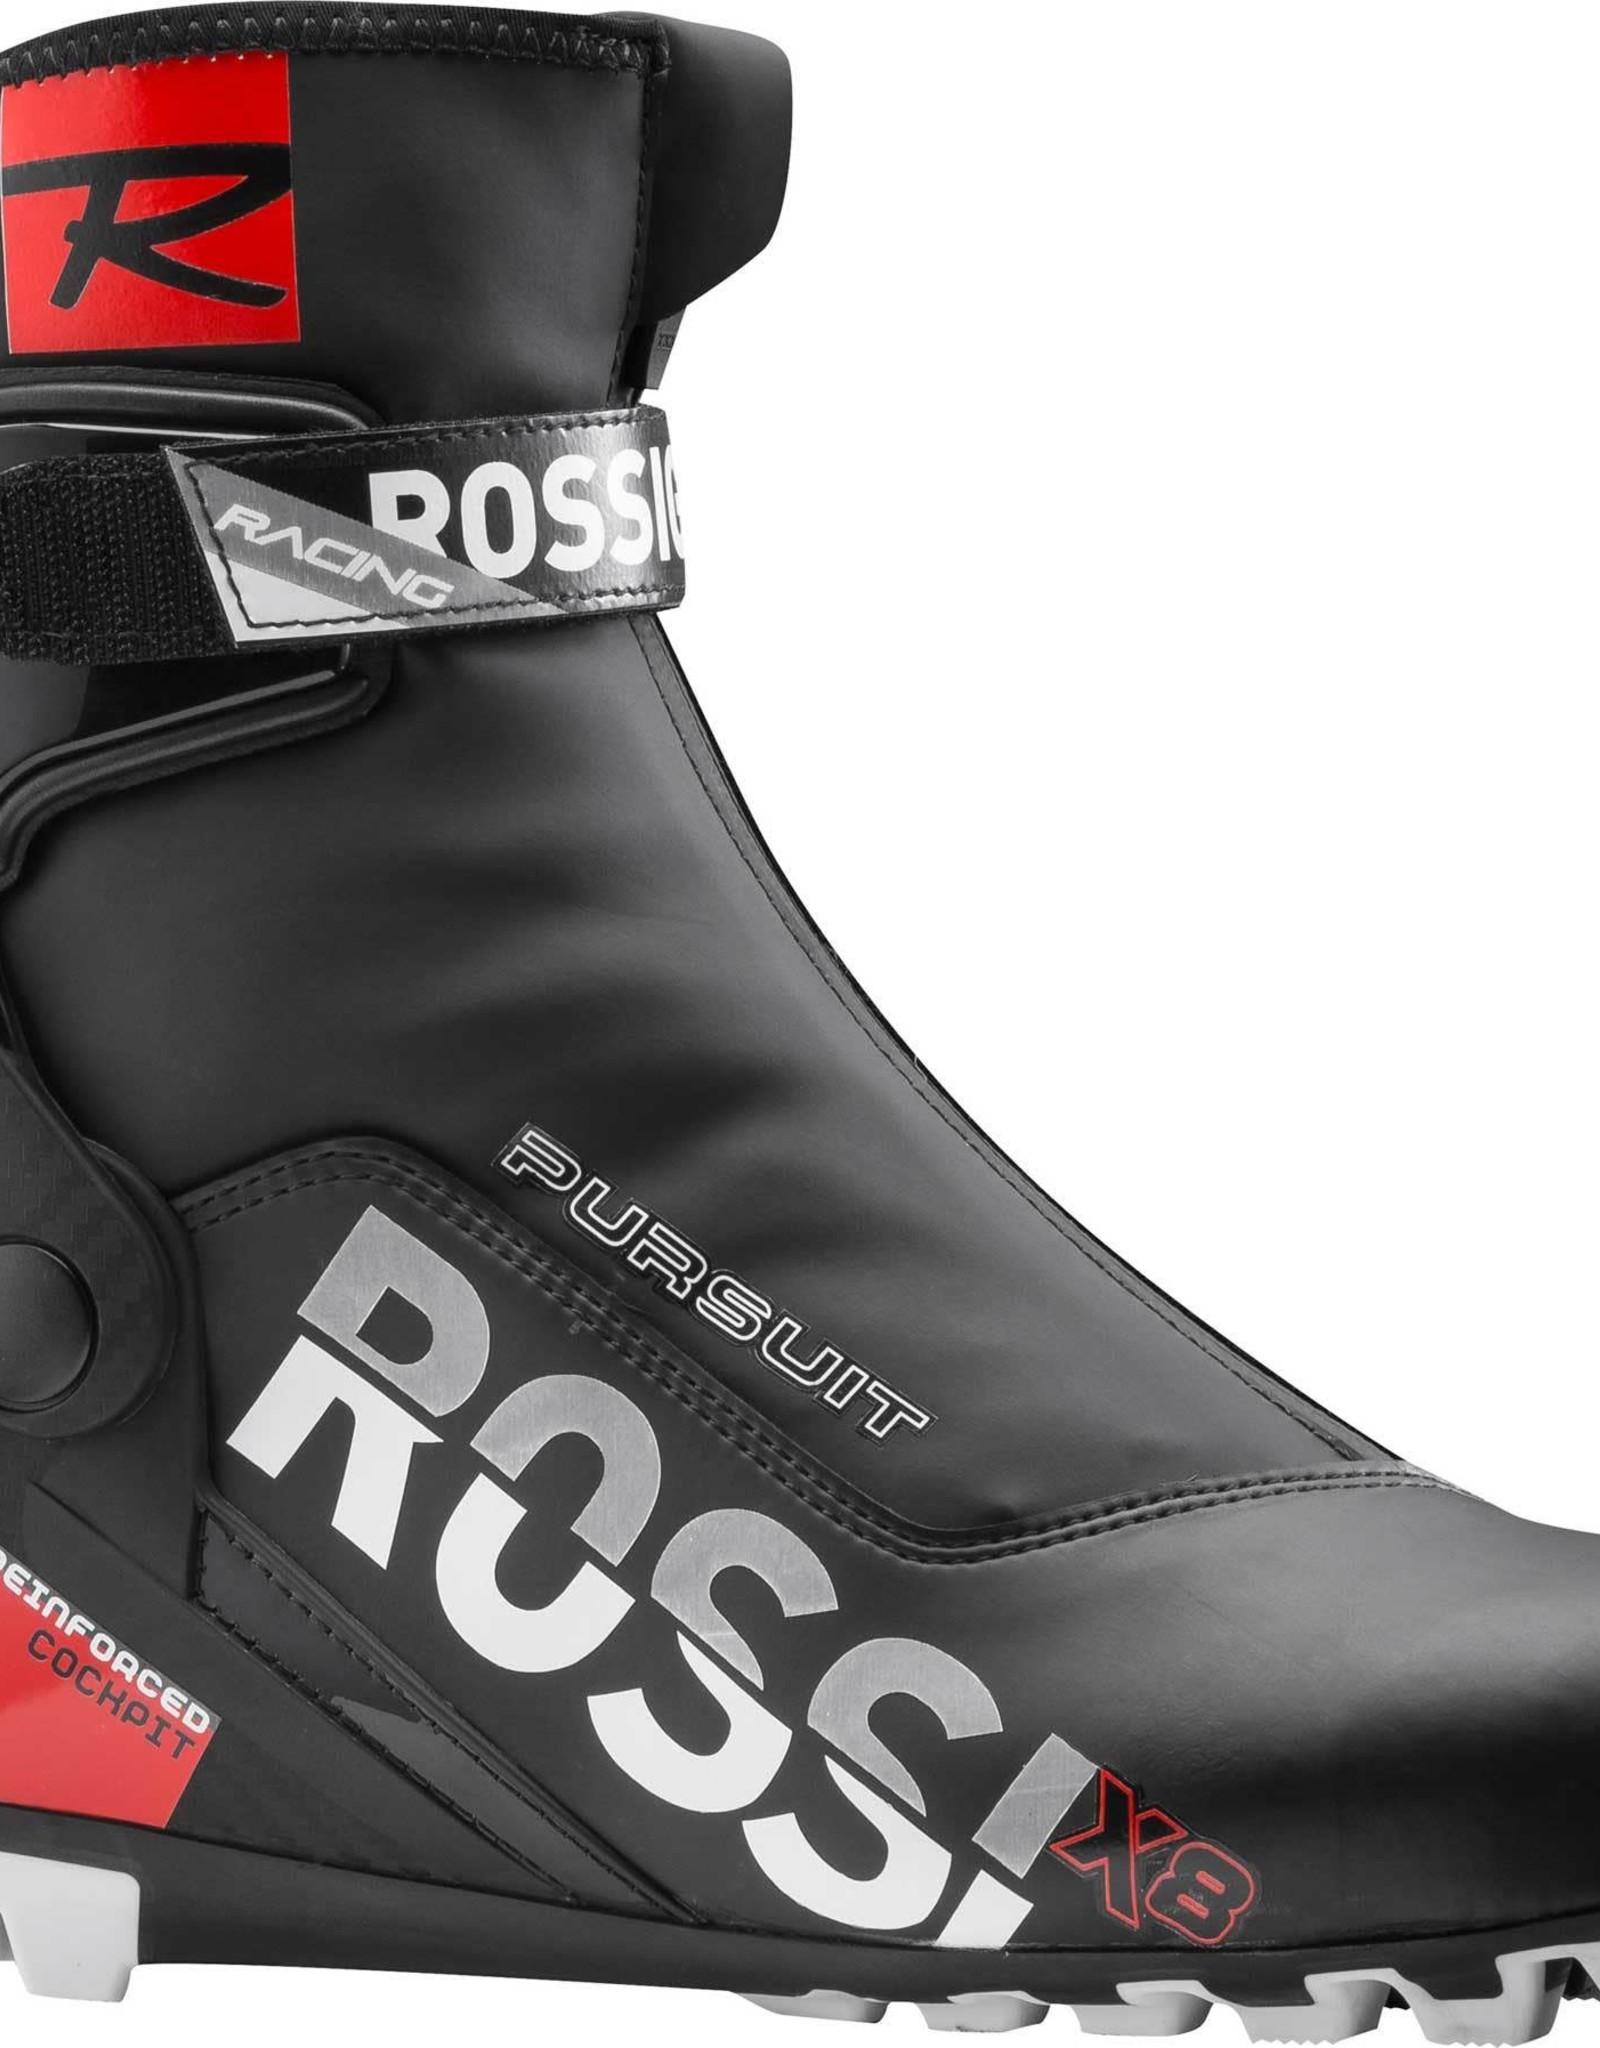 Boots de snowboard neuve Rossignol Lace up